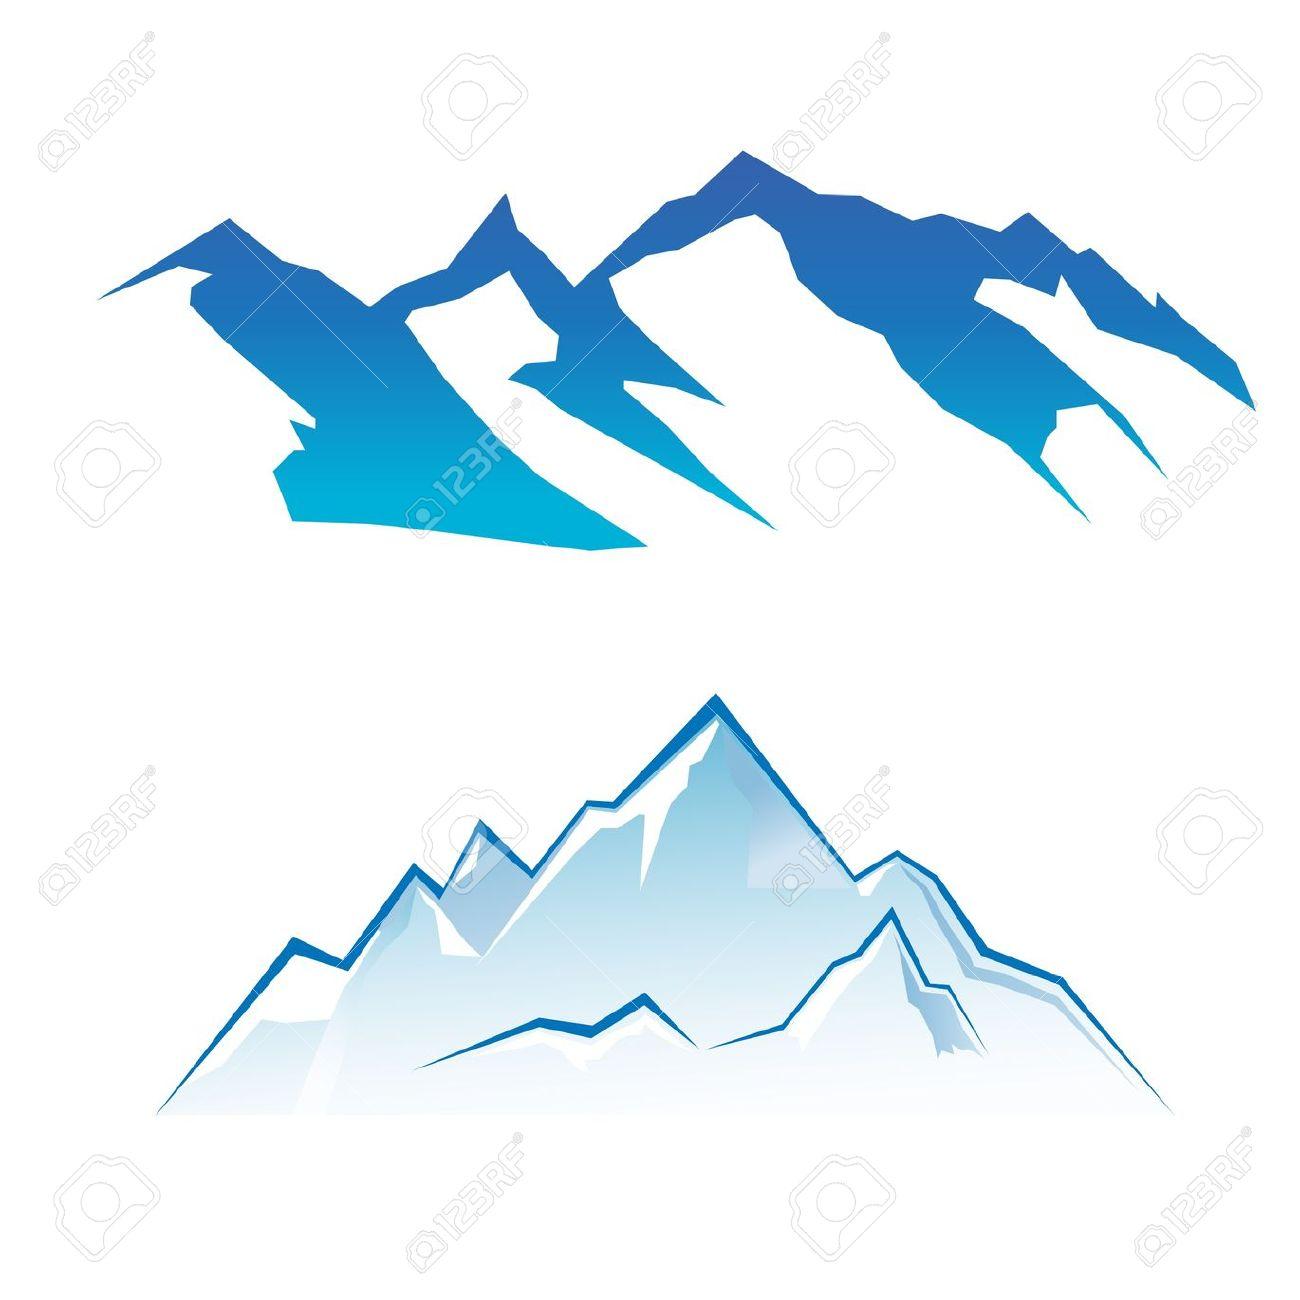 Mountain Range Clipart | Free download best Mountain Range ...